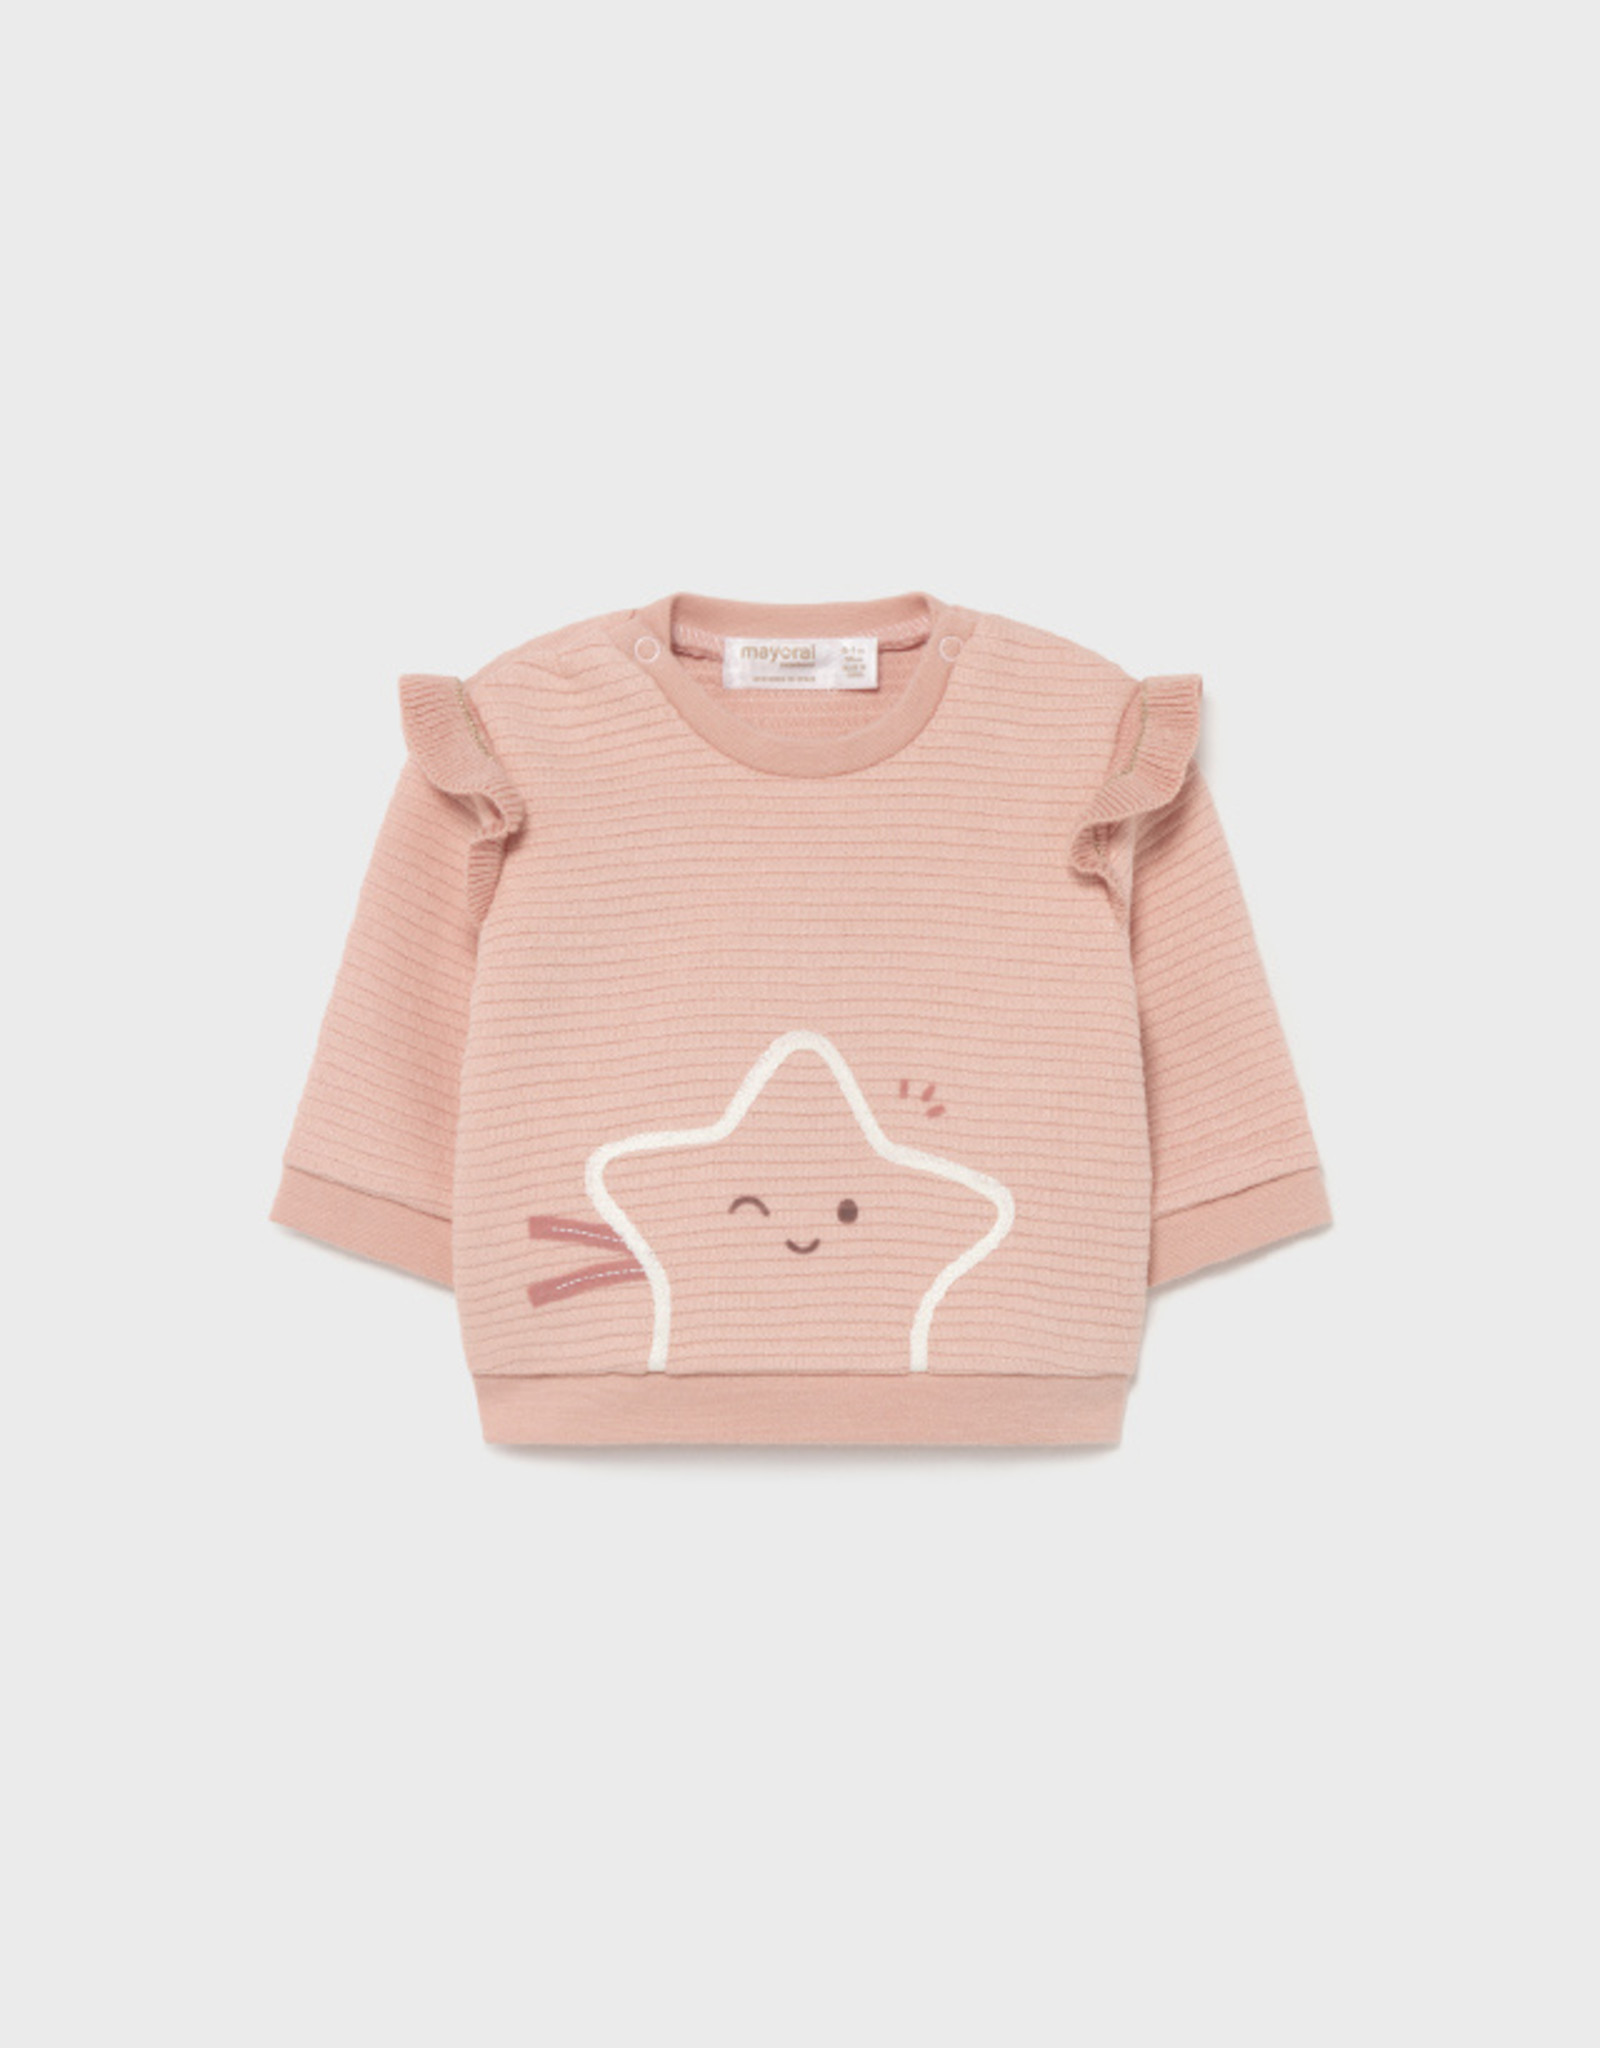 Mayoral FA21 BbyG Pink Star Sweater